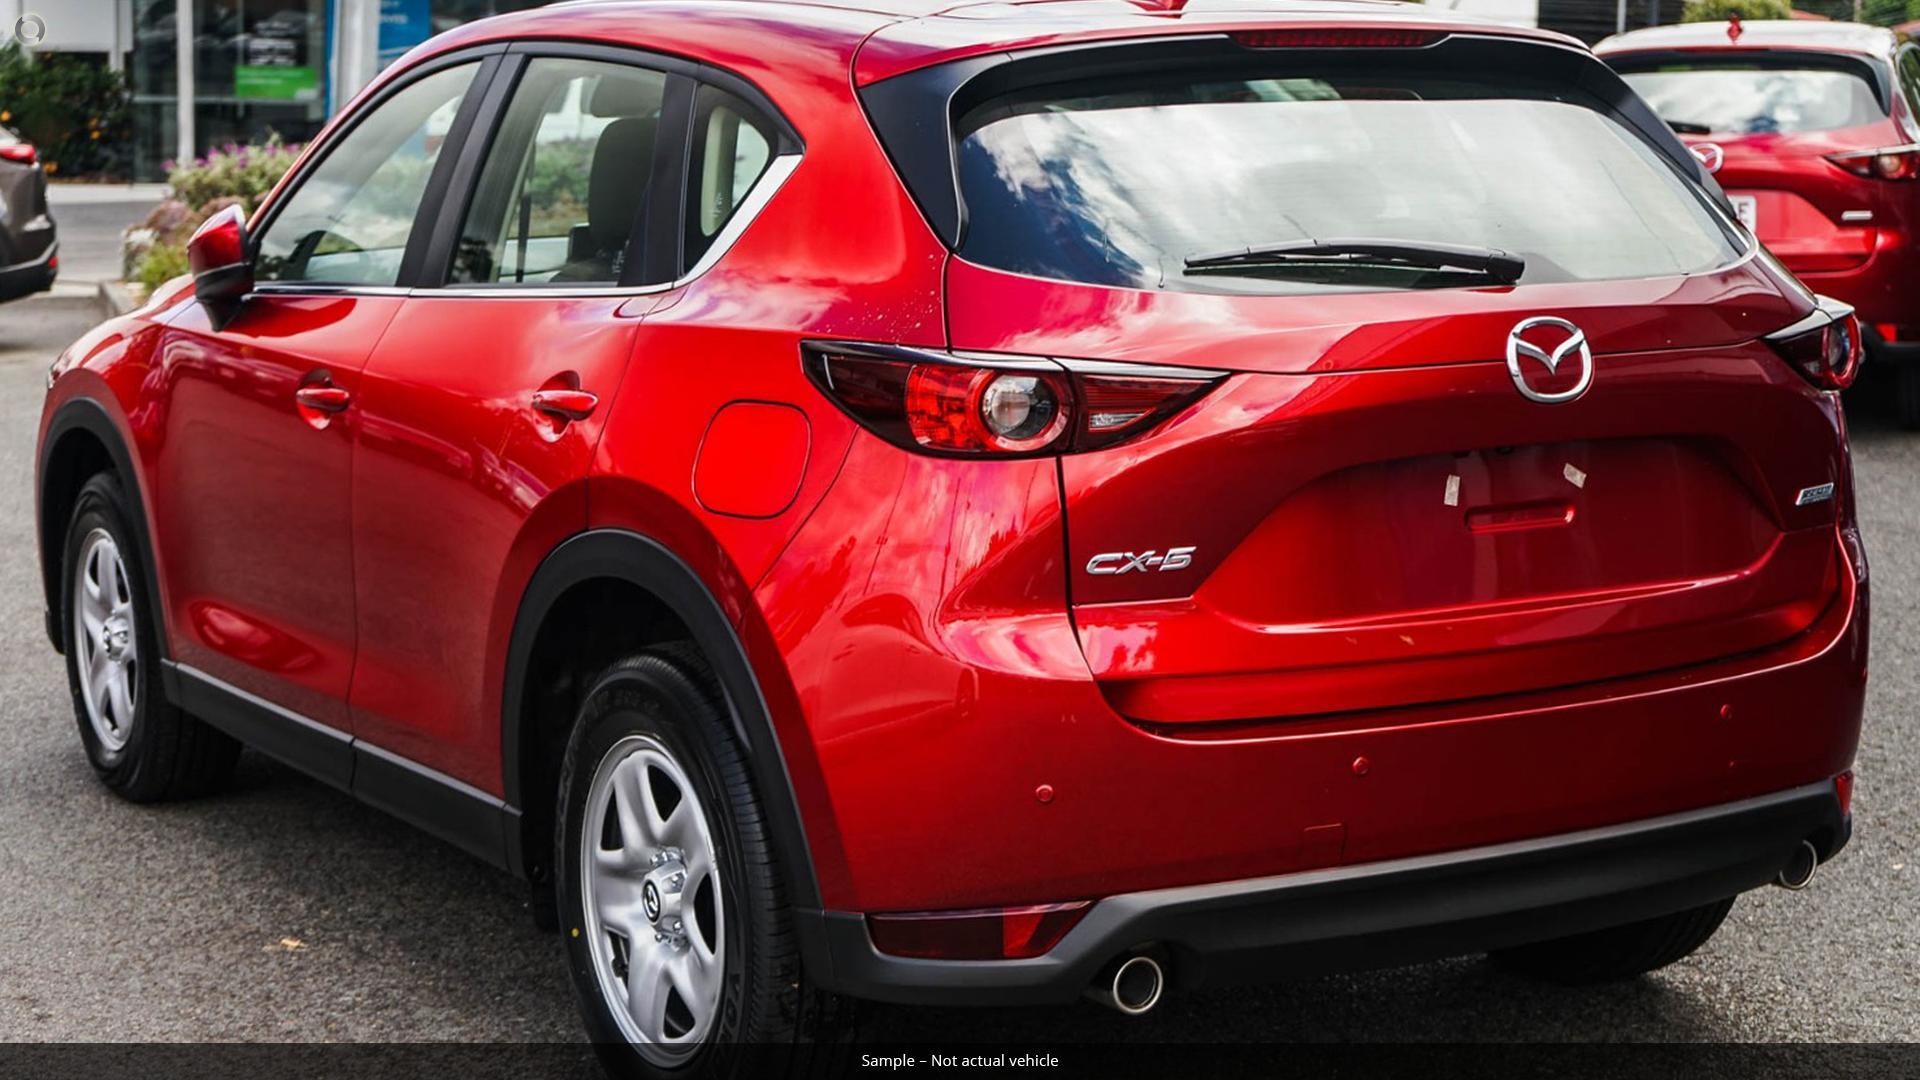 Mazda Cx-5 Maxx KF Series